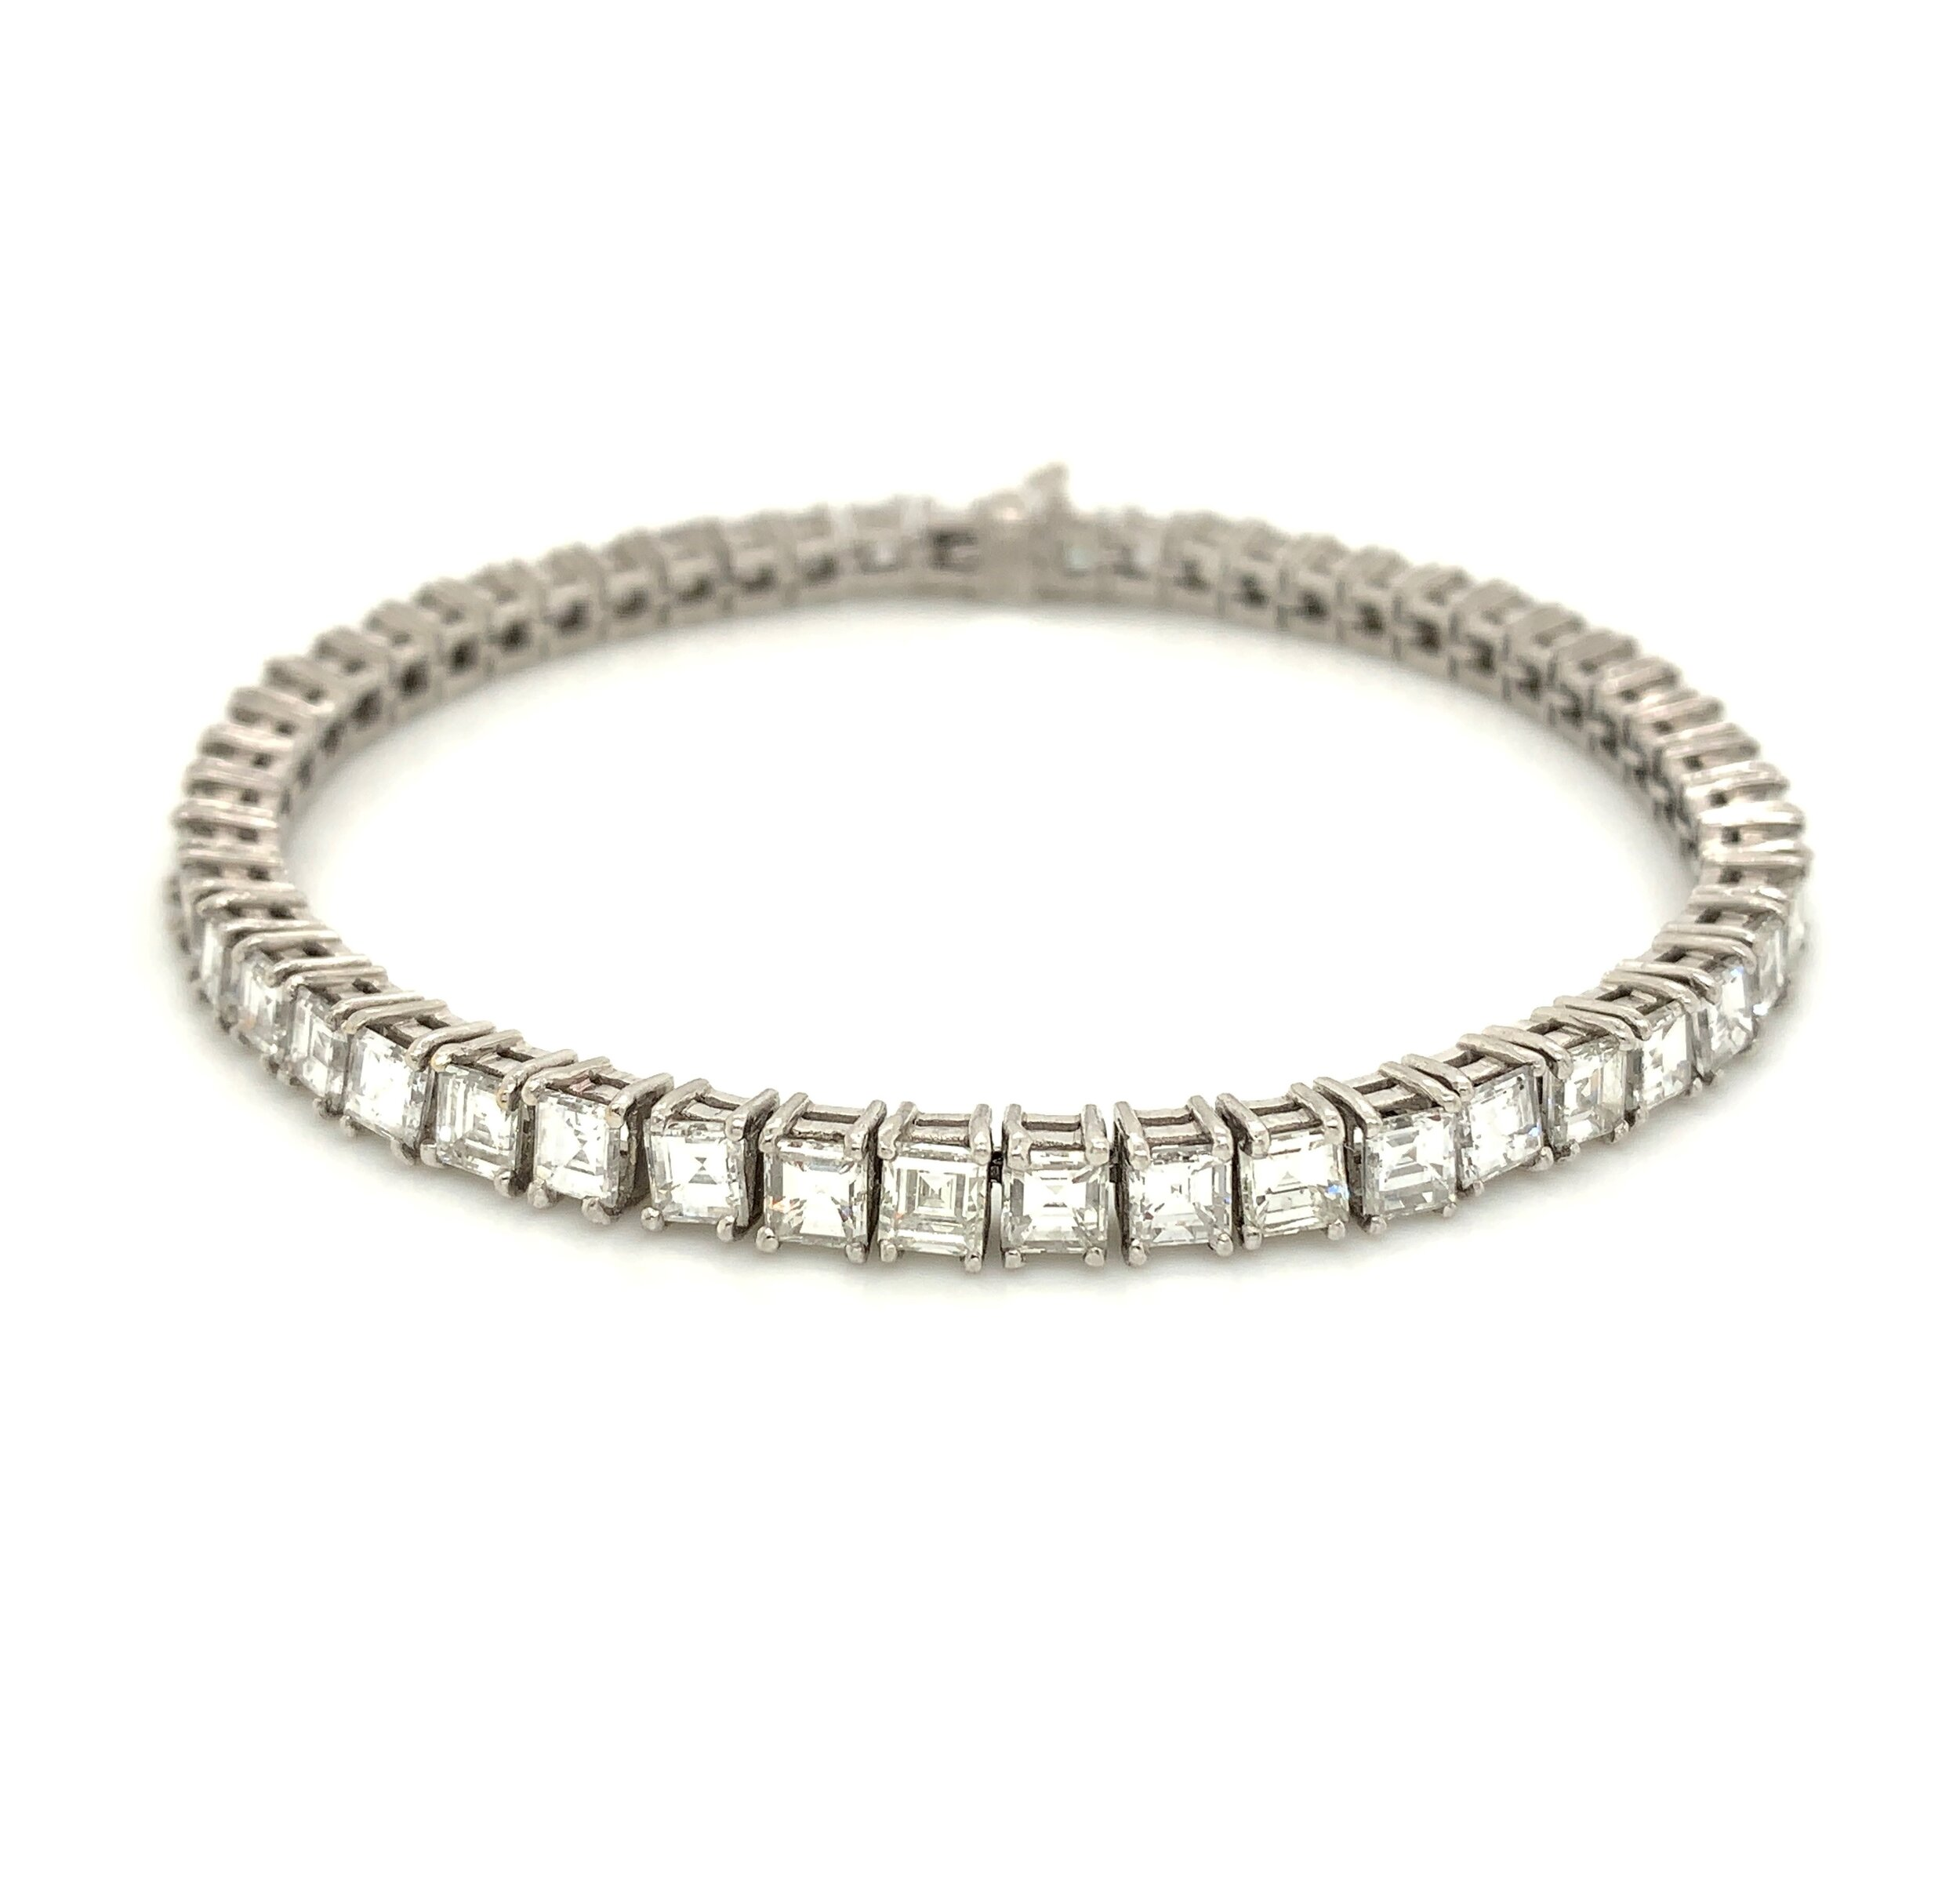 14.5ct Old Mine Cut Diamond Tennis Bracelet  Est. US$ 12,000-18,000